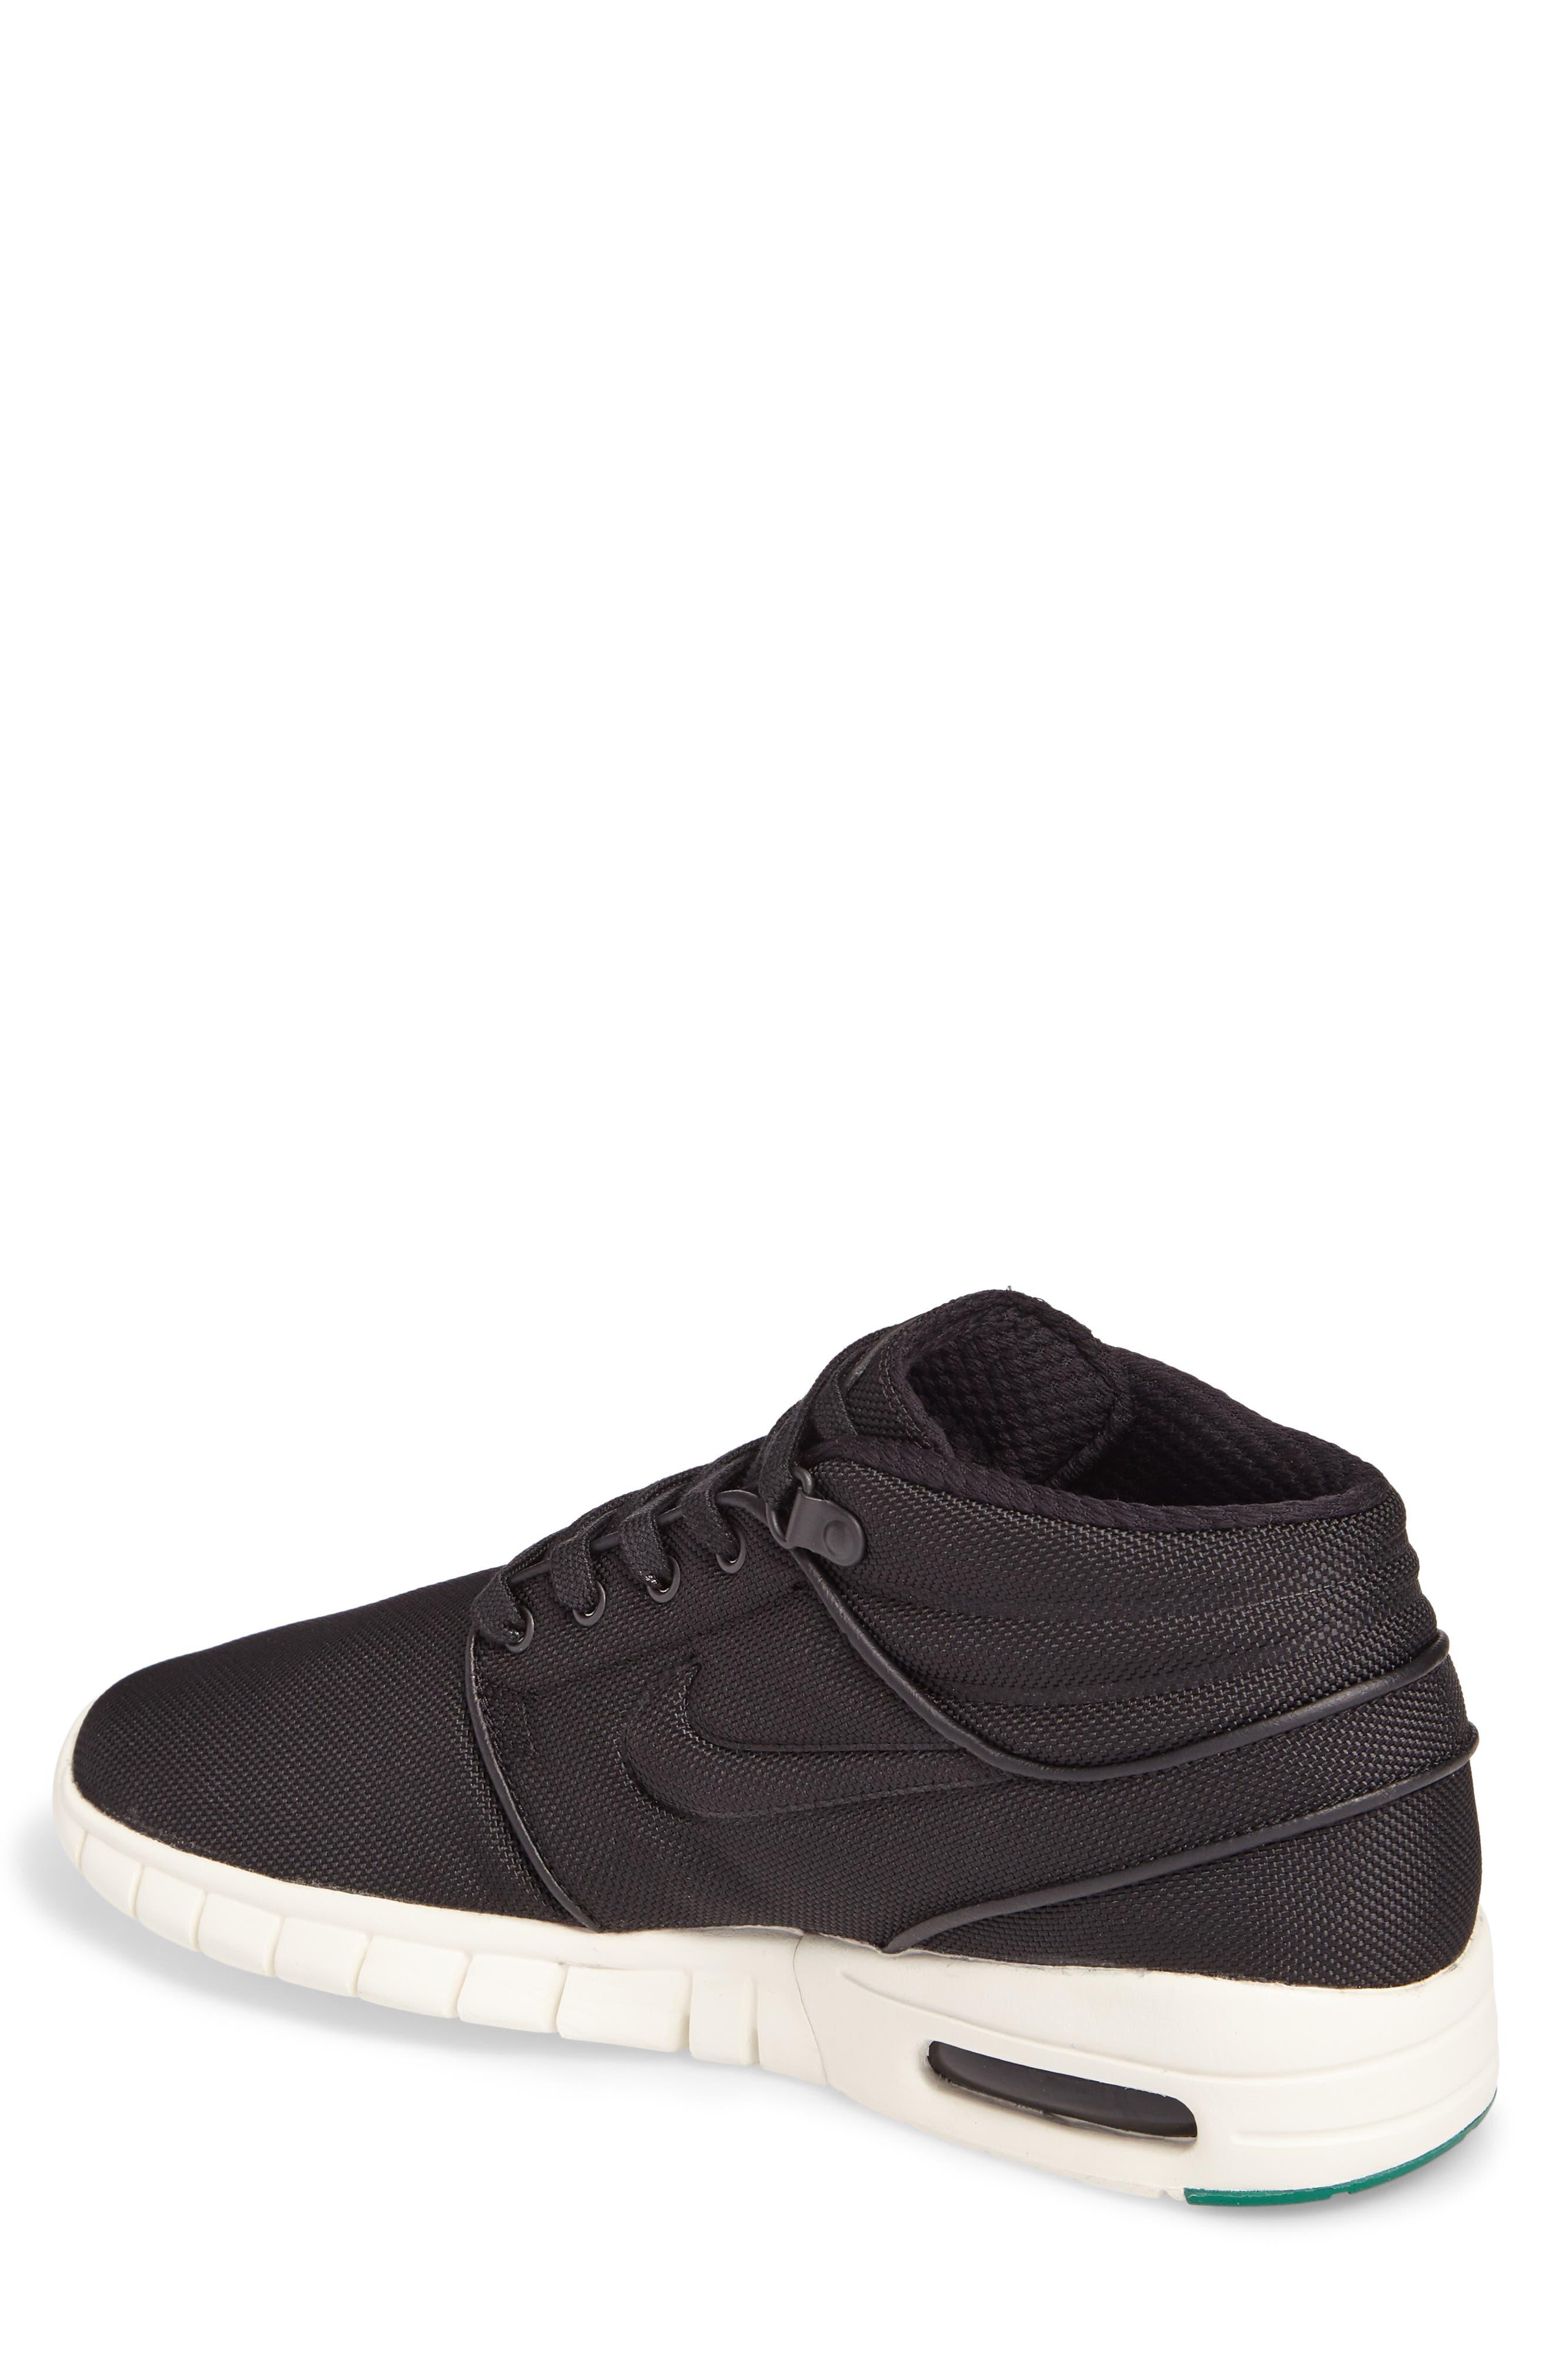 Alternate Image 2  - Nike SB Stefan Janoski Max Mid Skate Shoe (Men)